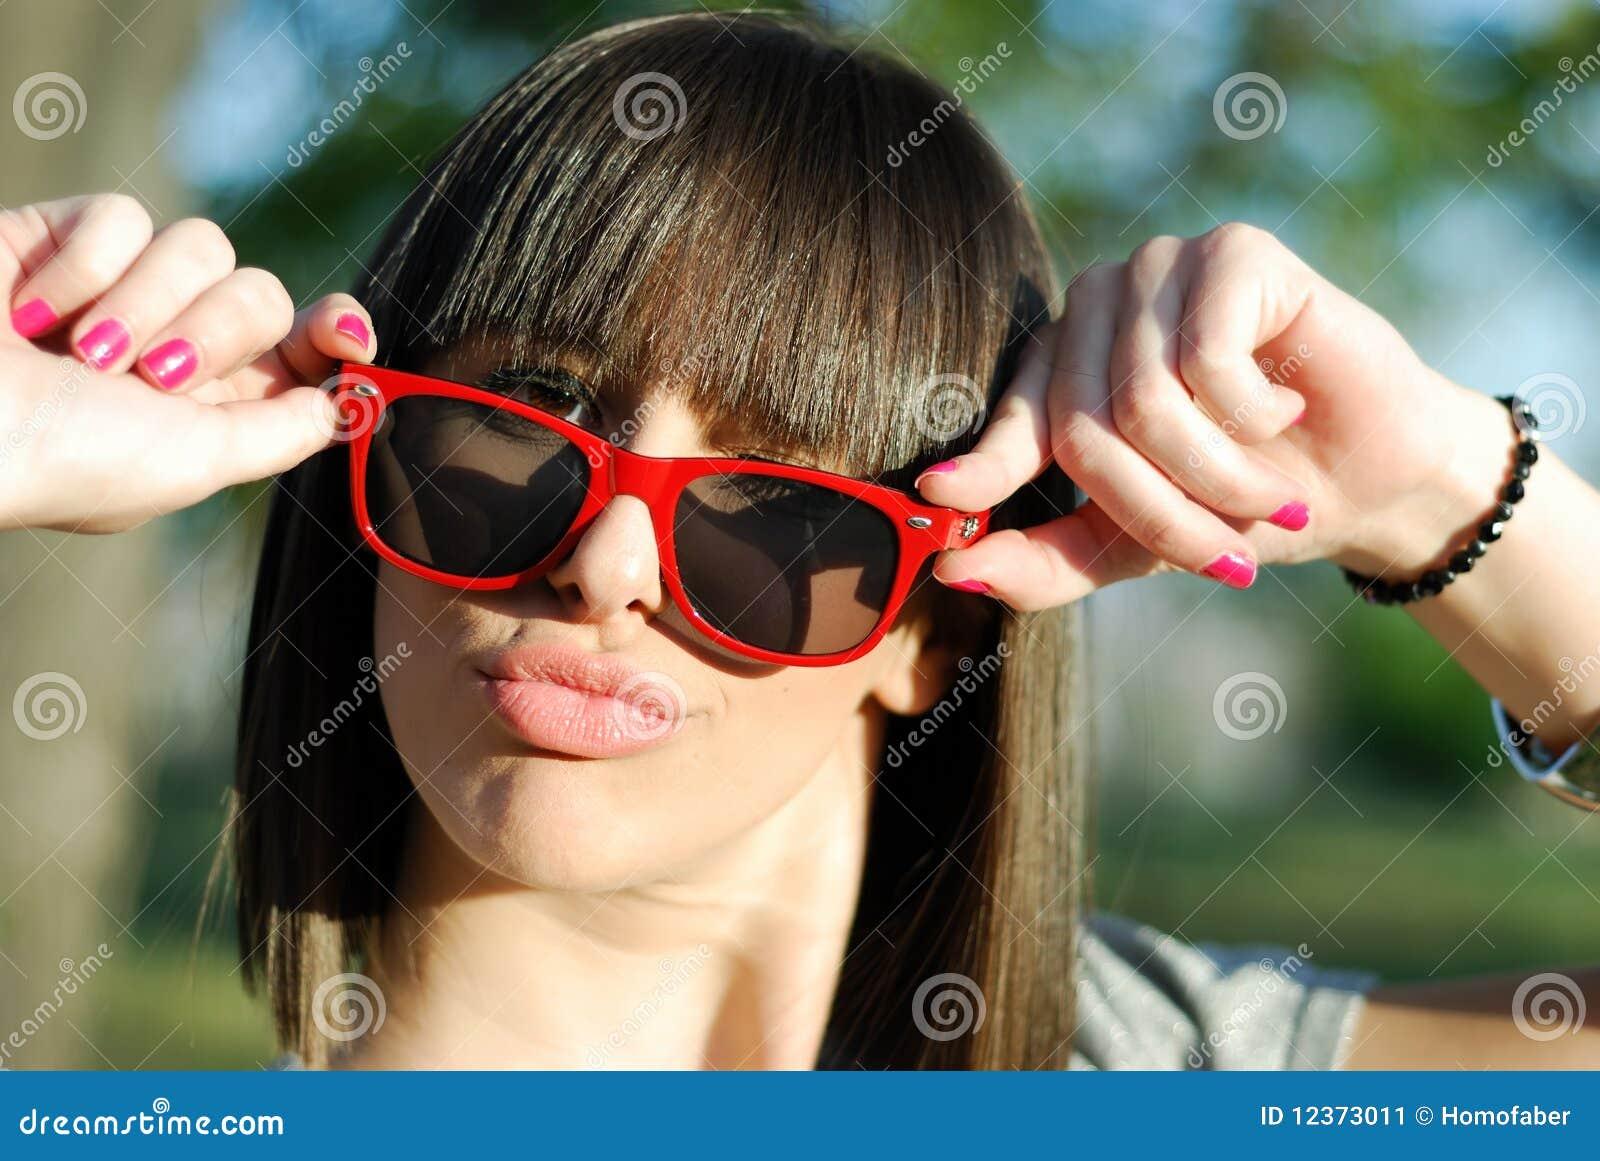 nikon sunglasses jmk3  nikon sunglasses